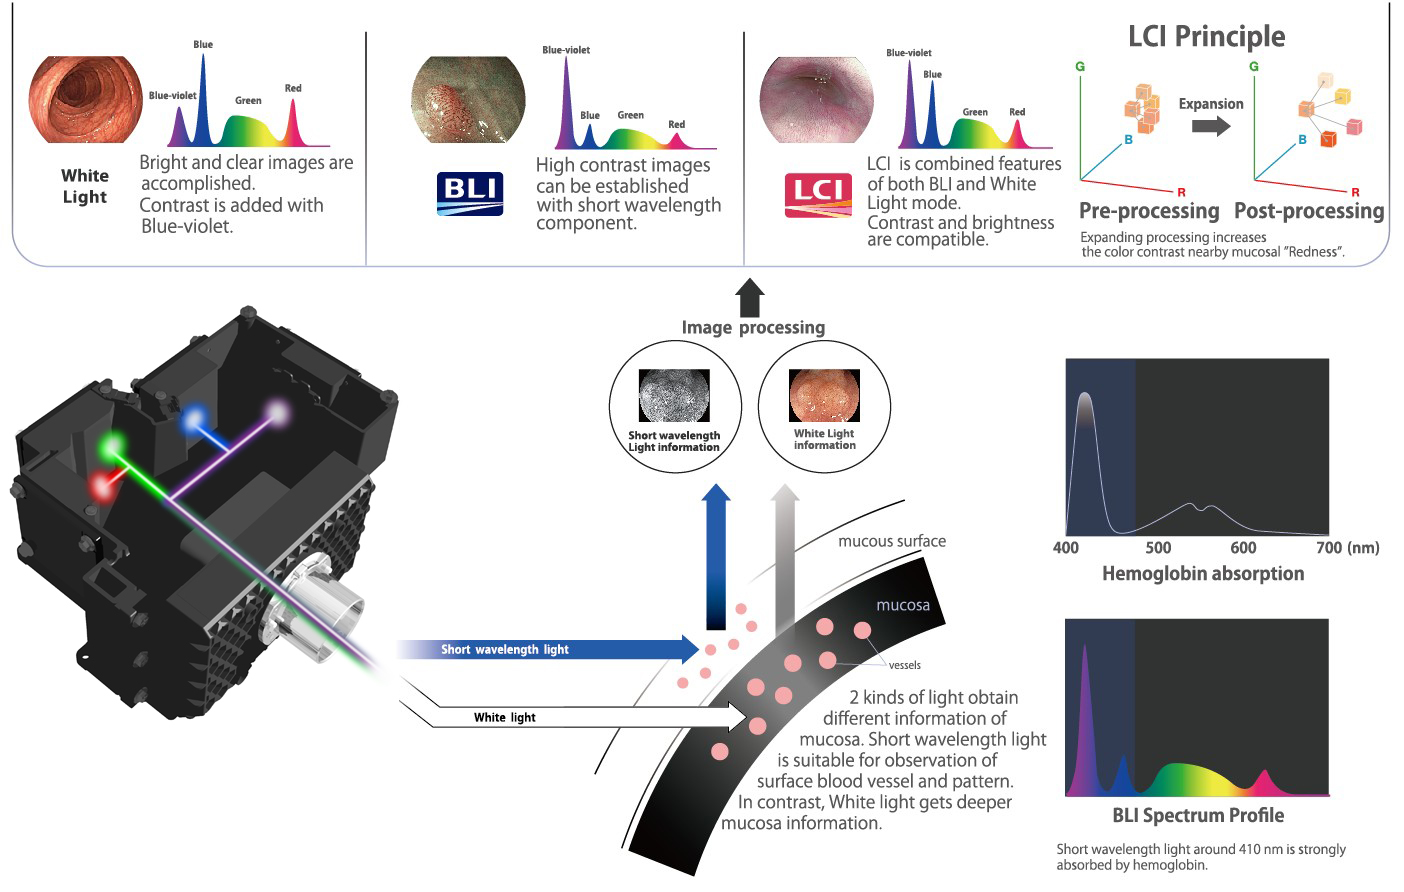 [image] White Light, Blue Light Imaging, Linked Color Imaging modes